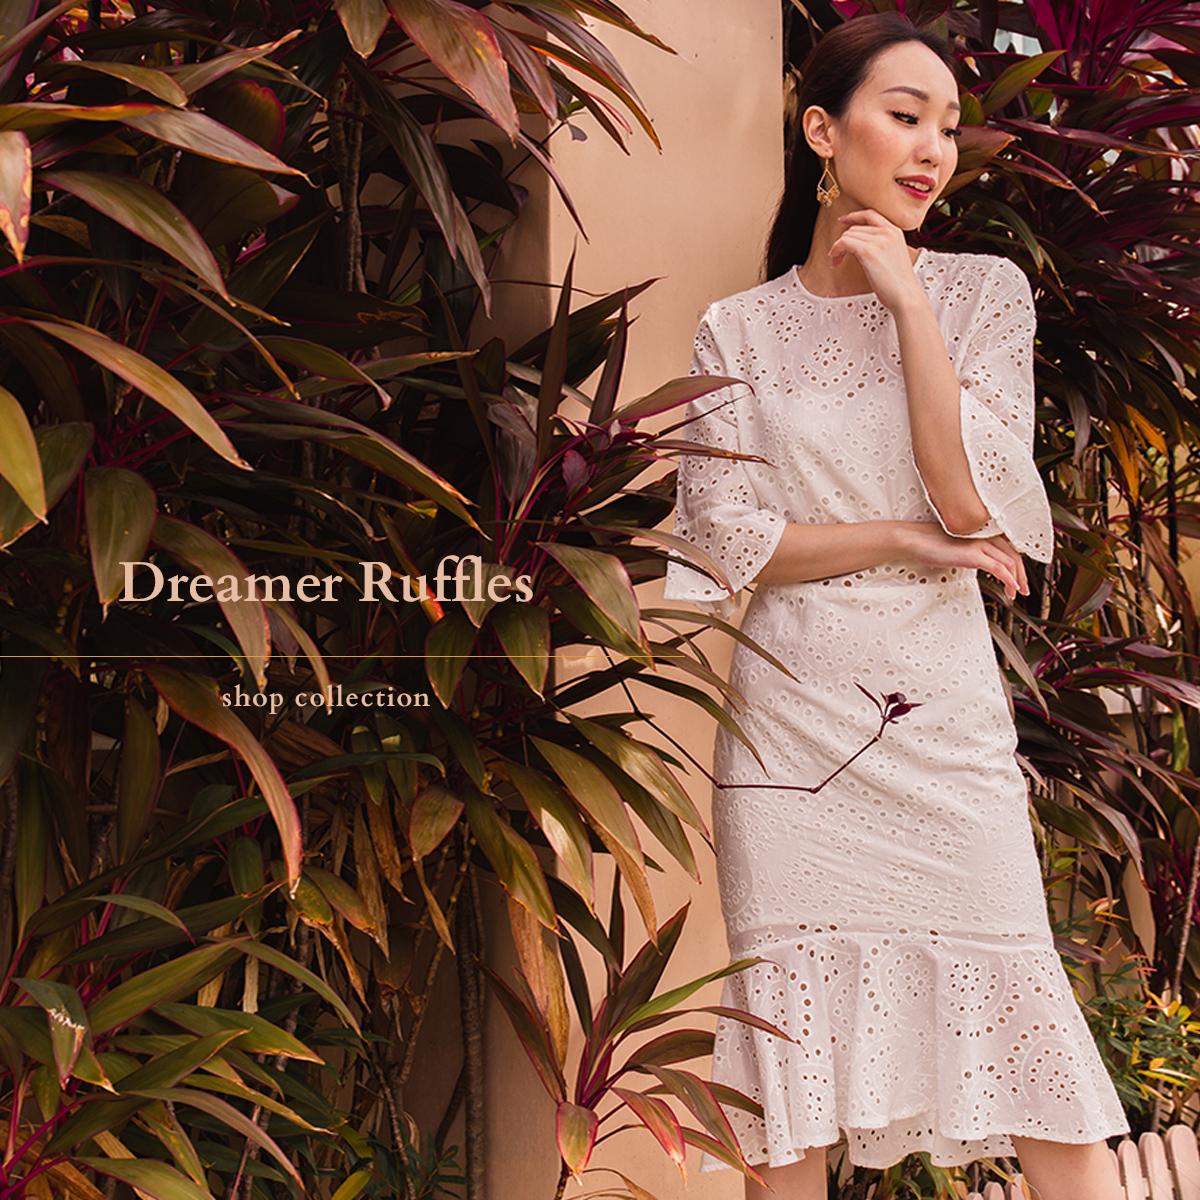 Dreamer ruffles 01